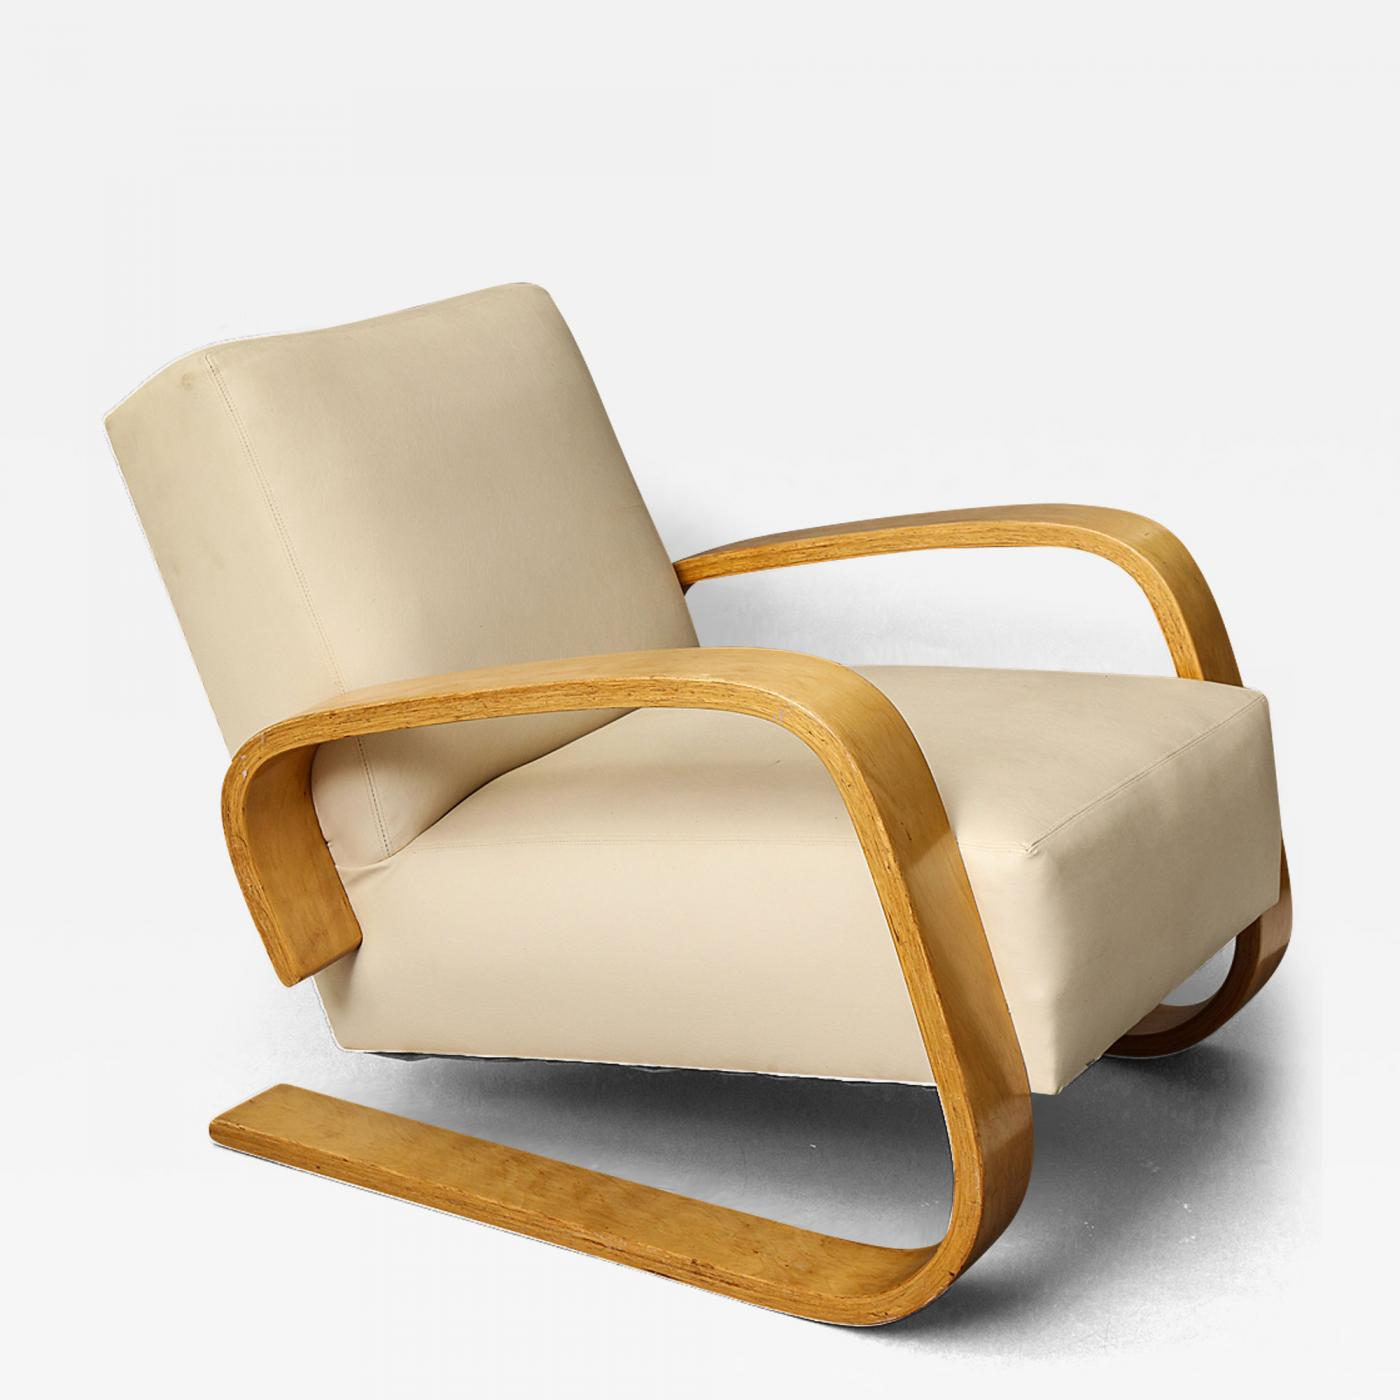 11 Scandinavian Mid Century Modern Furniture Design Pioneers Whose